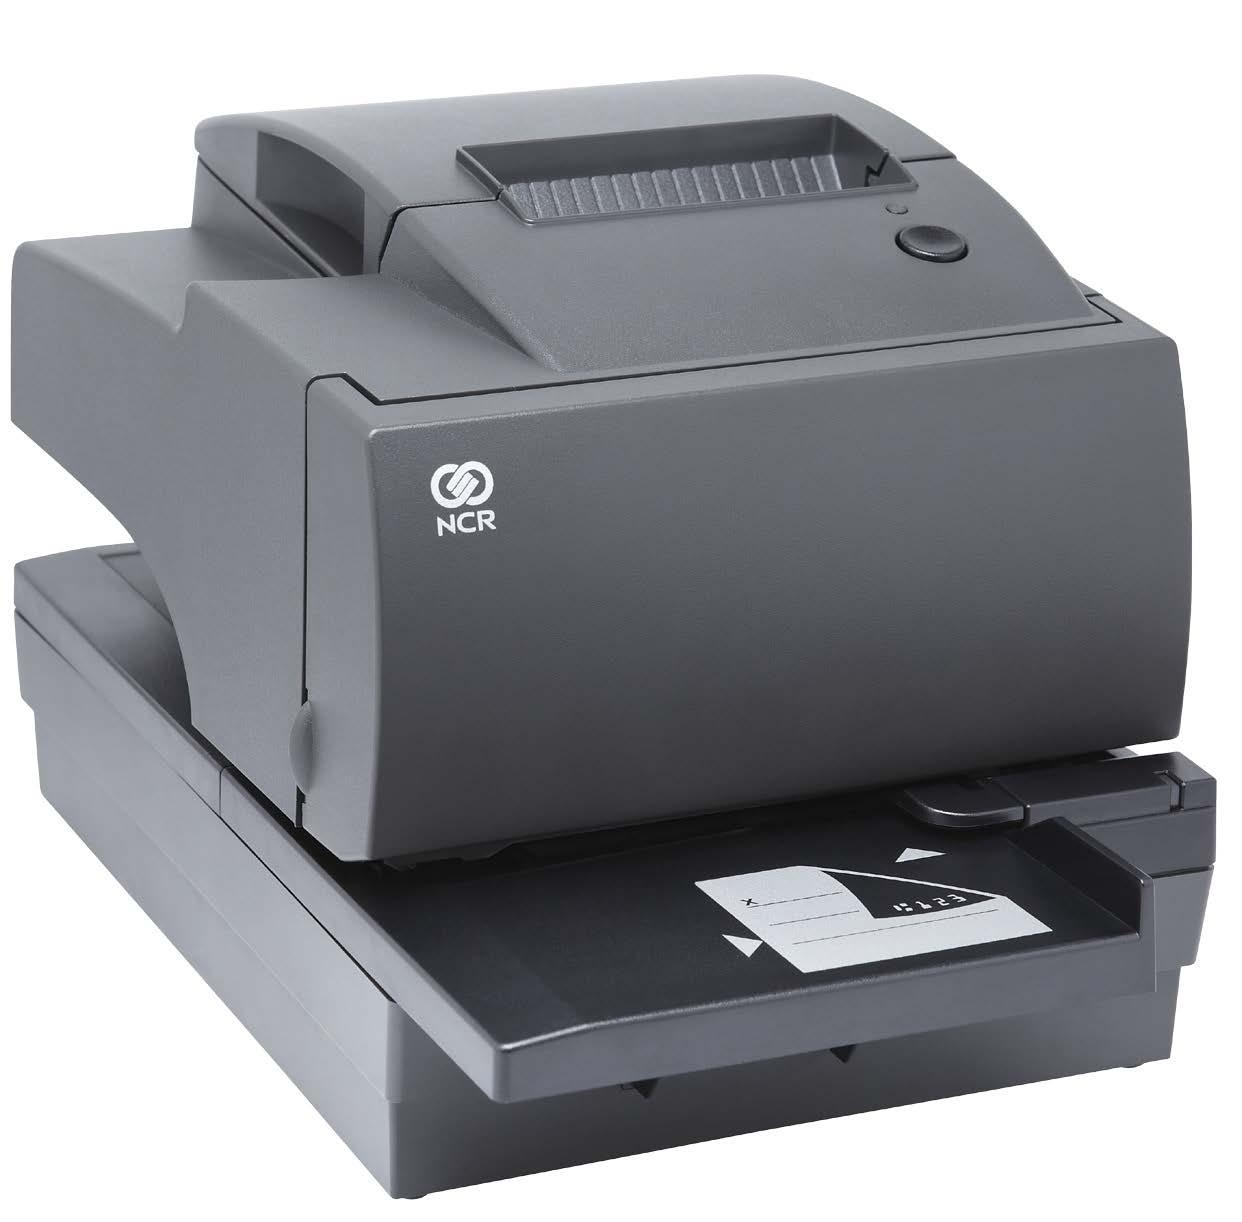 7167-multifunction-printer-ds